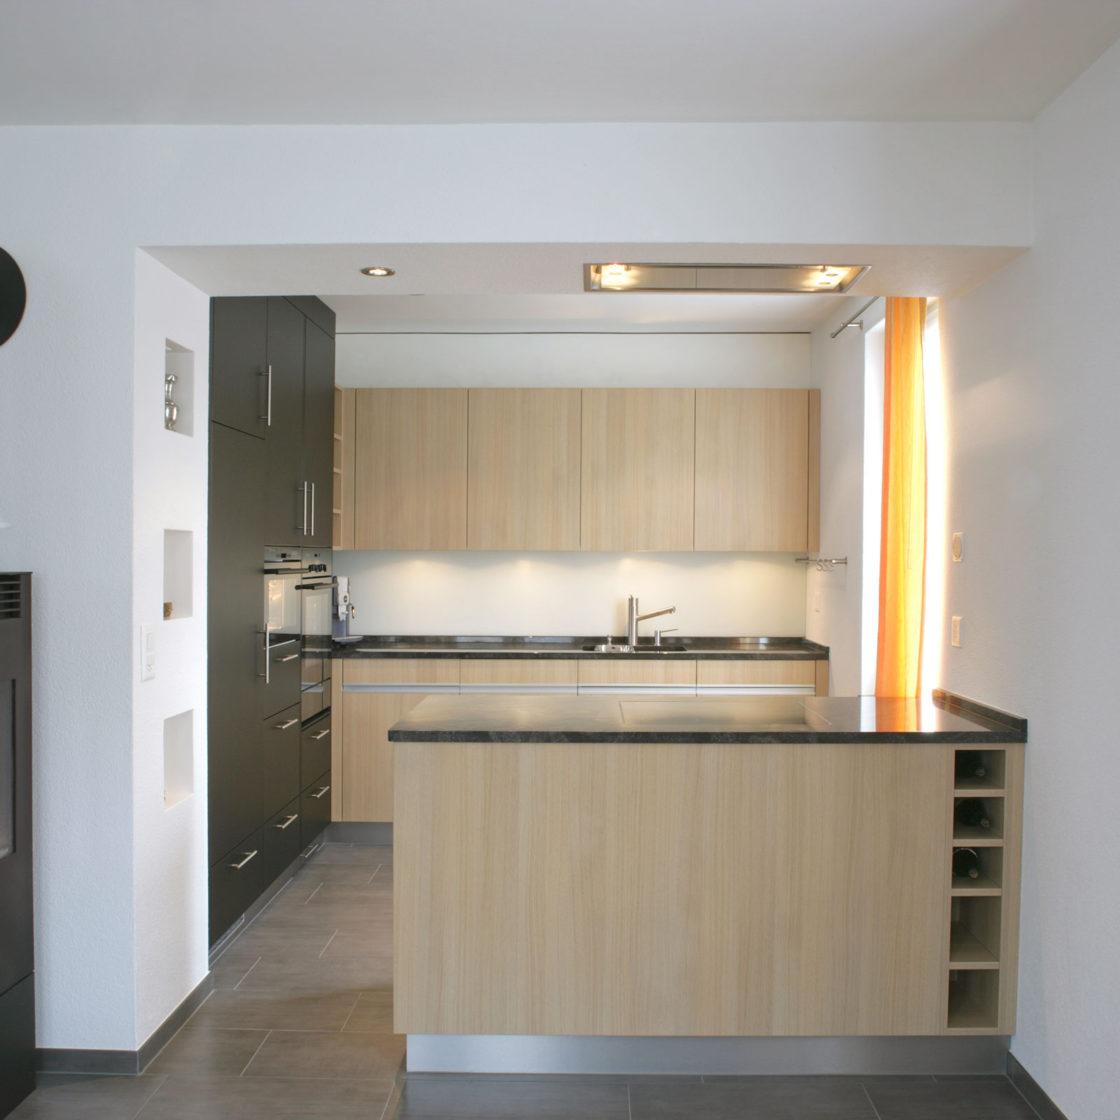 Küche_FriedliAusbau_Ref6_1